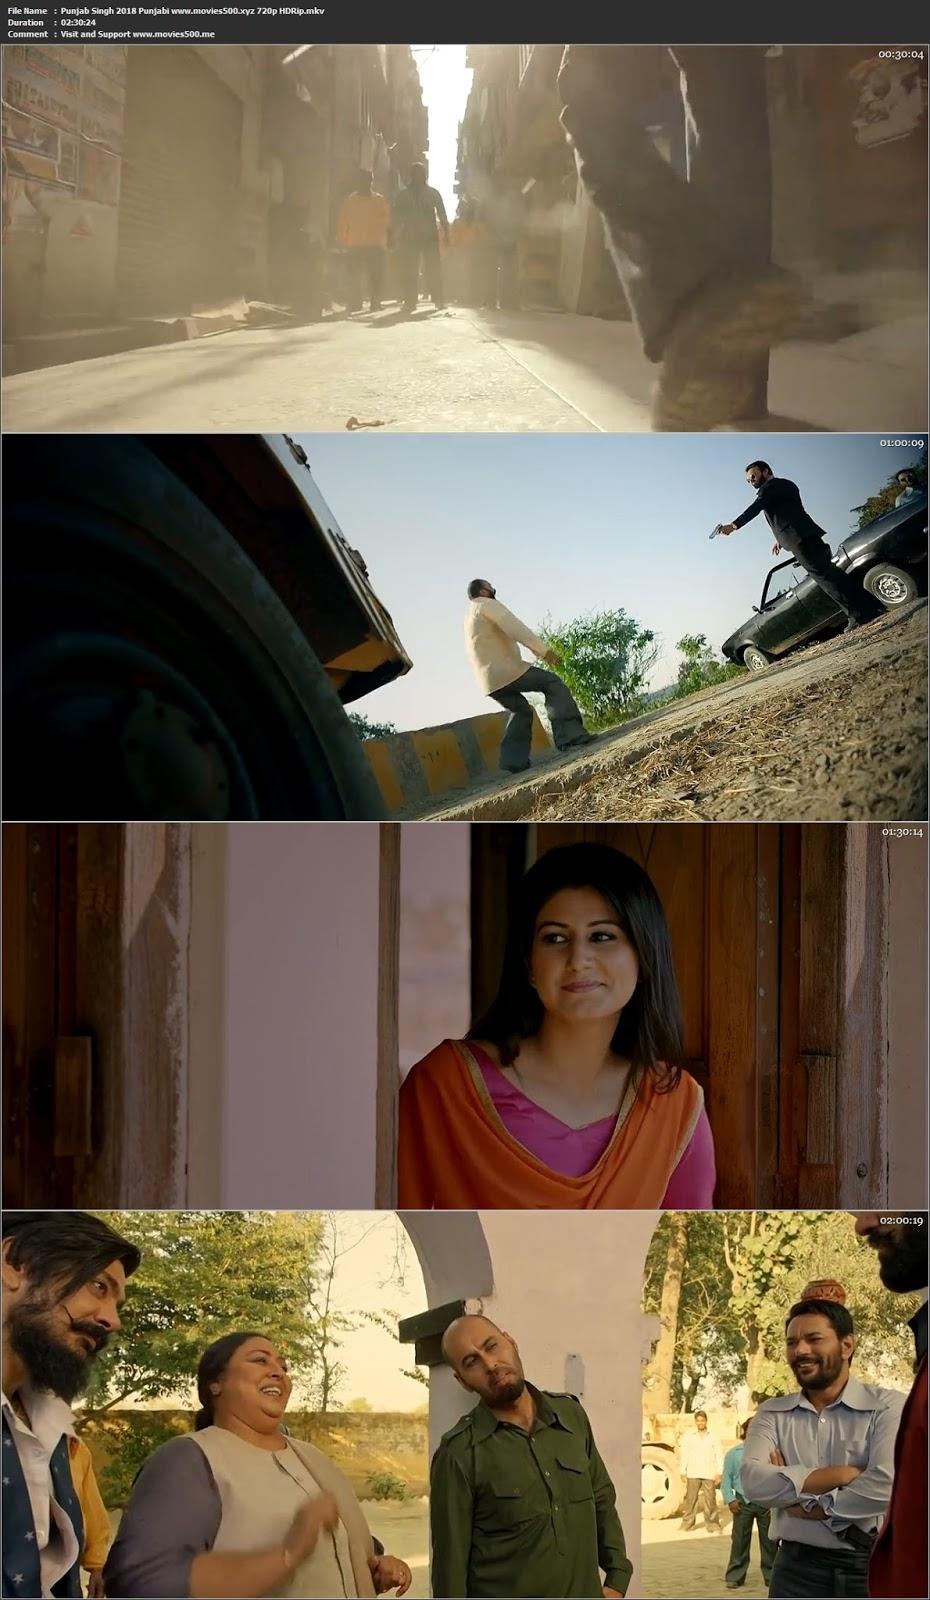 Punjab Singh 2018 Punjabi Full Movie HDRip 720p at sandrastclairphotography.com